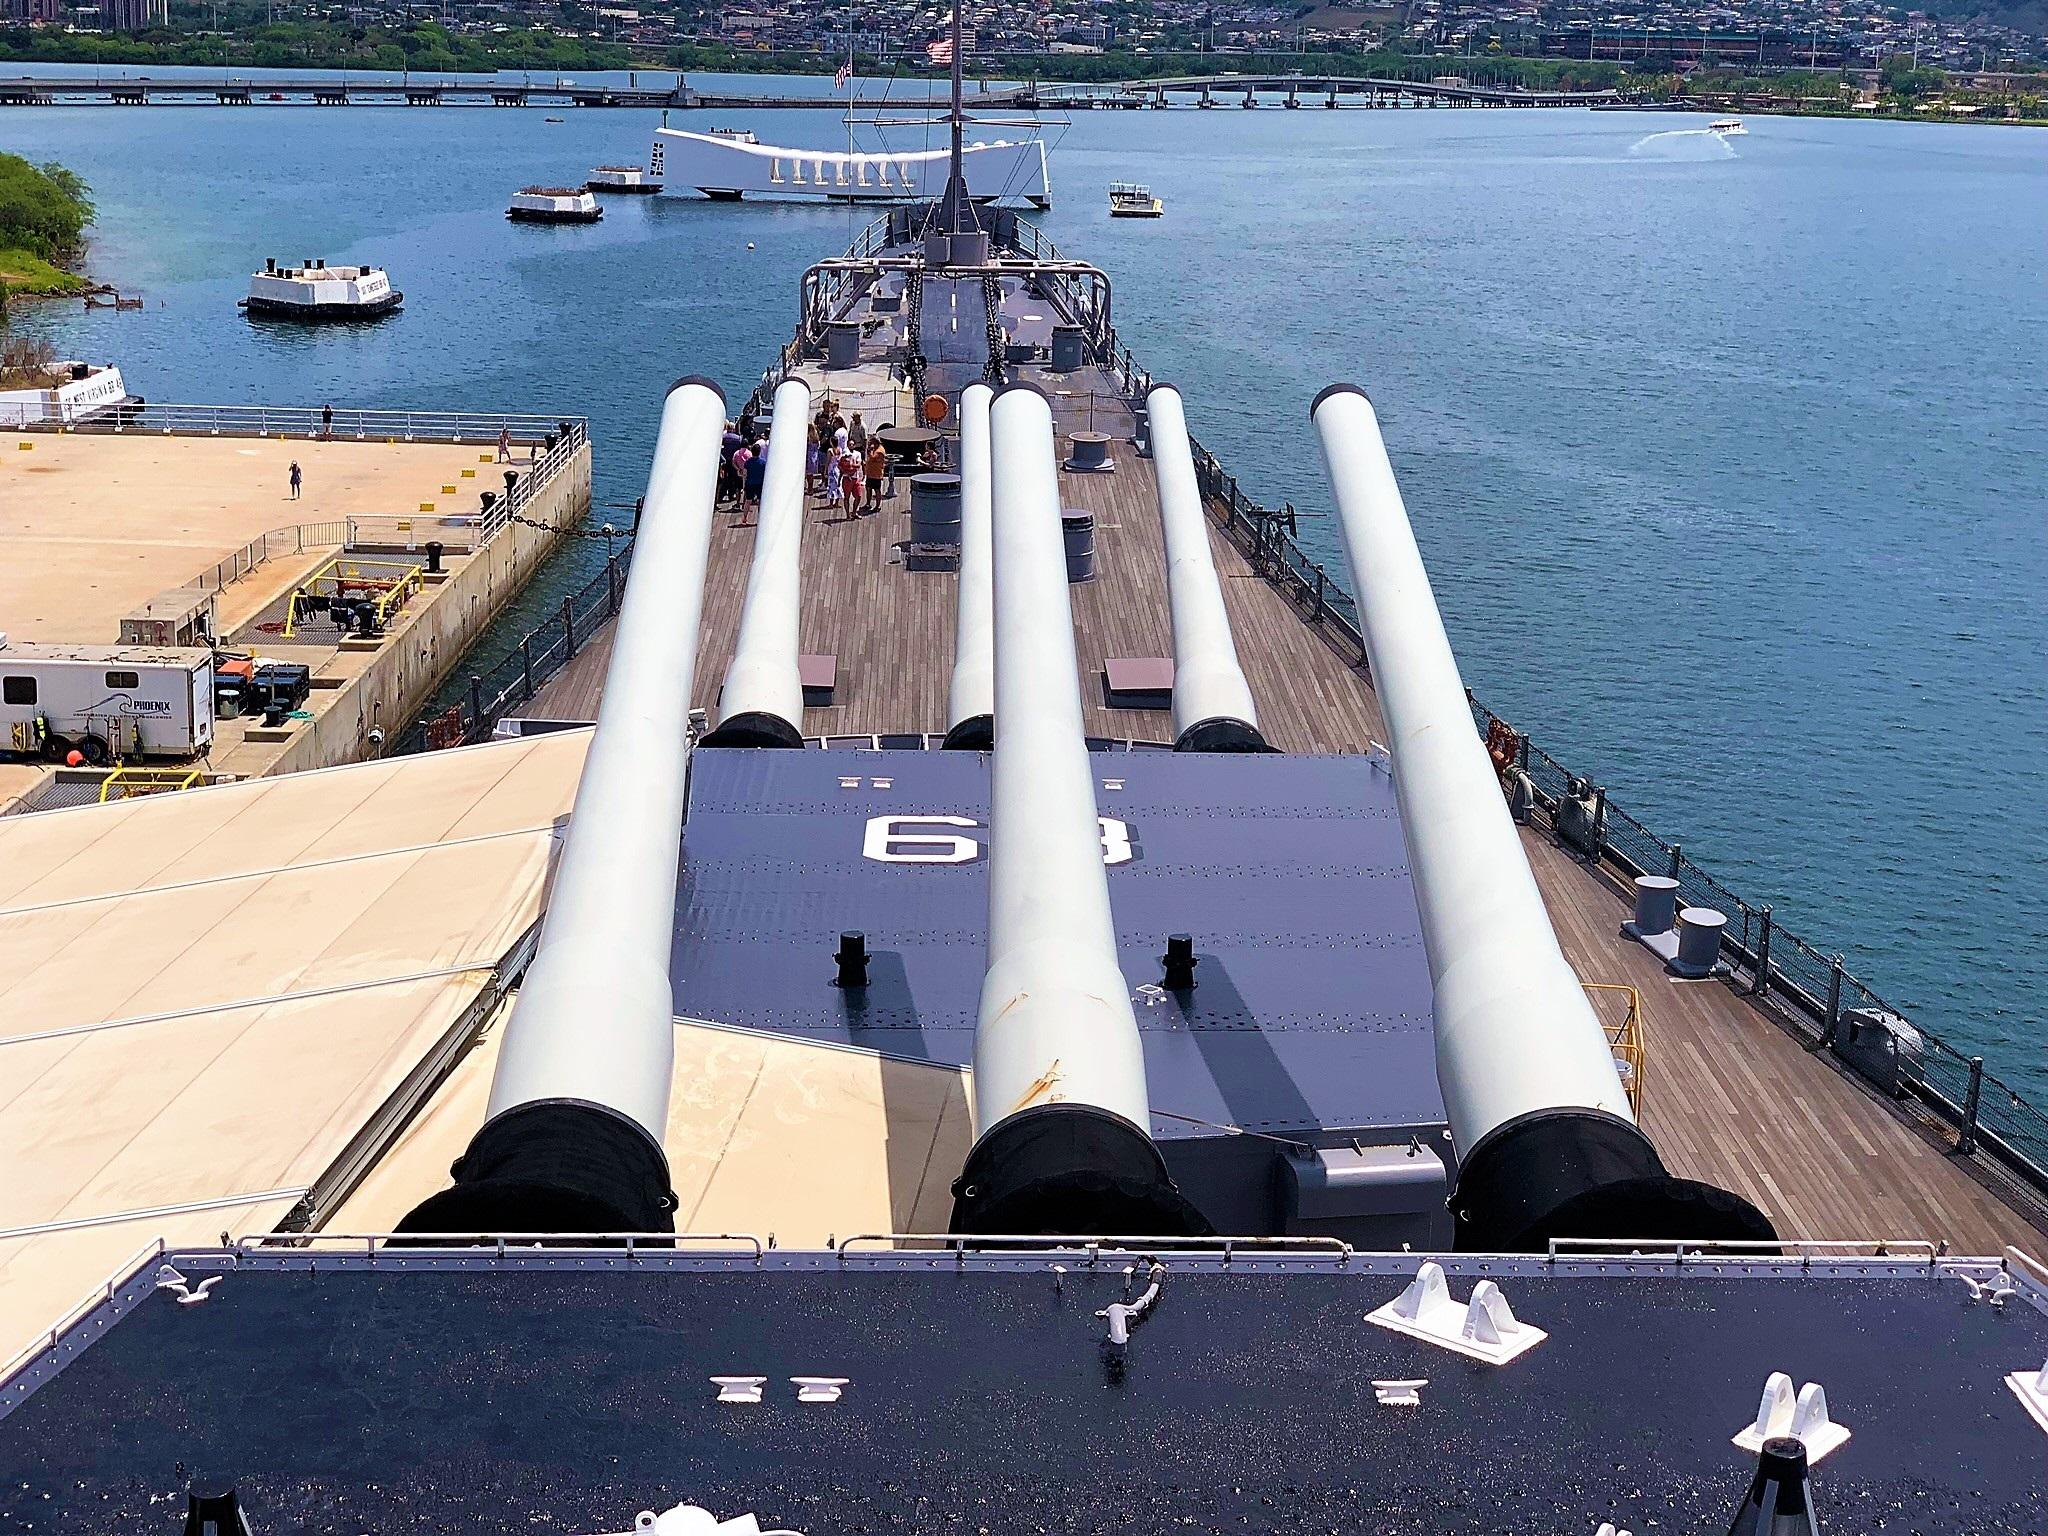 USS Missouri in Pearl Harbor Honolulu Hawaii